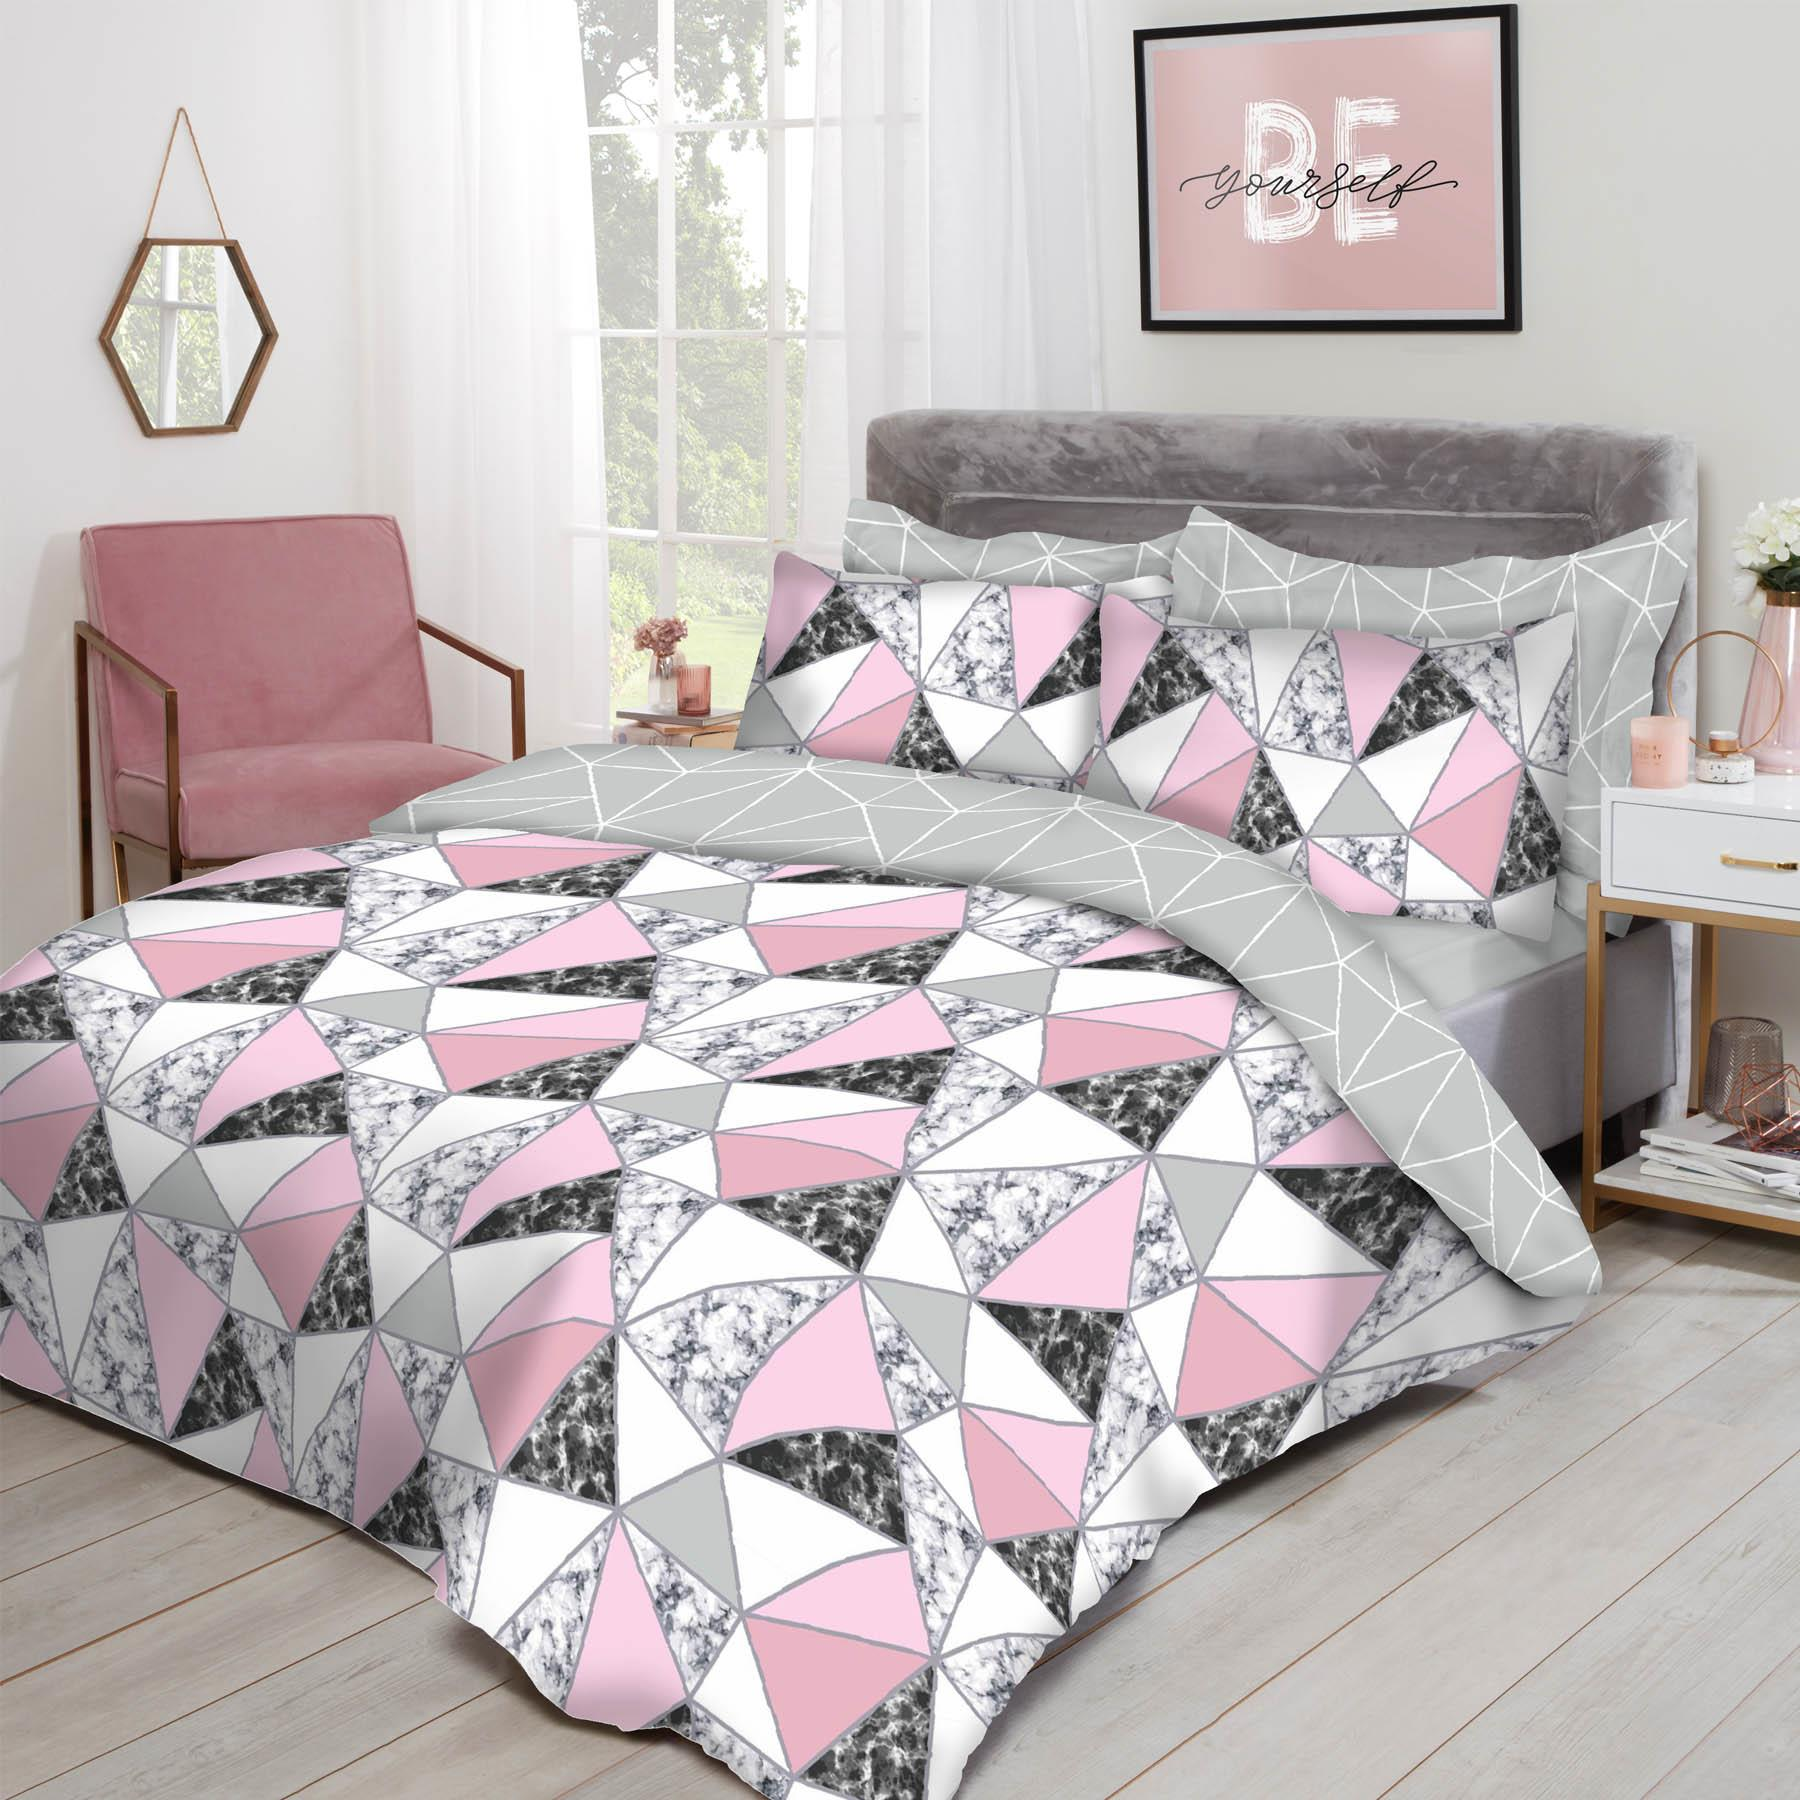 thumbnail 3 - Dreamscene Marble Geometric Duvet Cover with Pillowcase Bedding Set Grey Blush